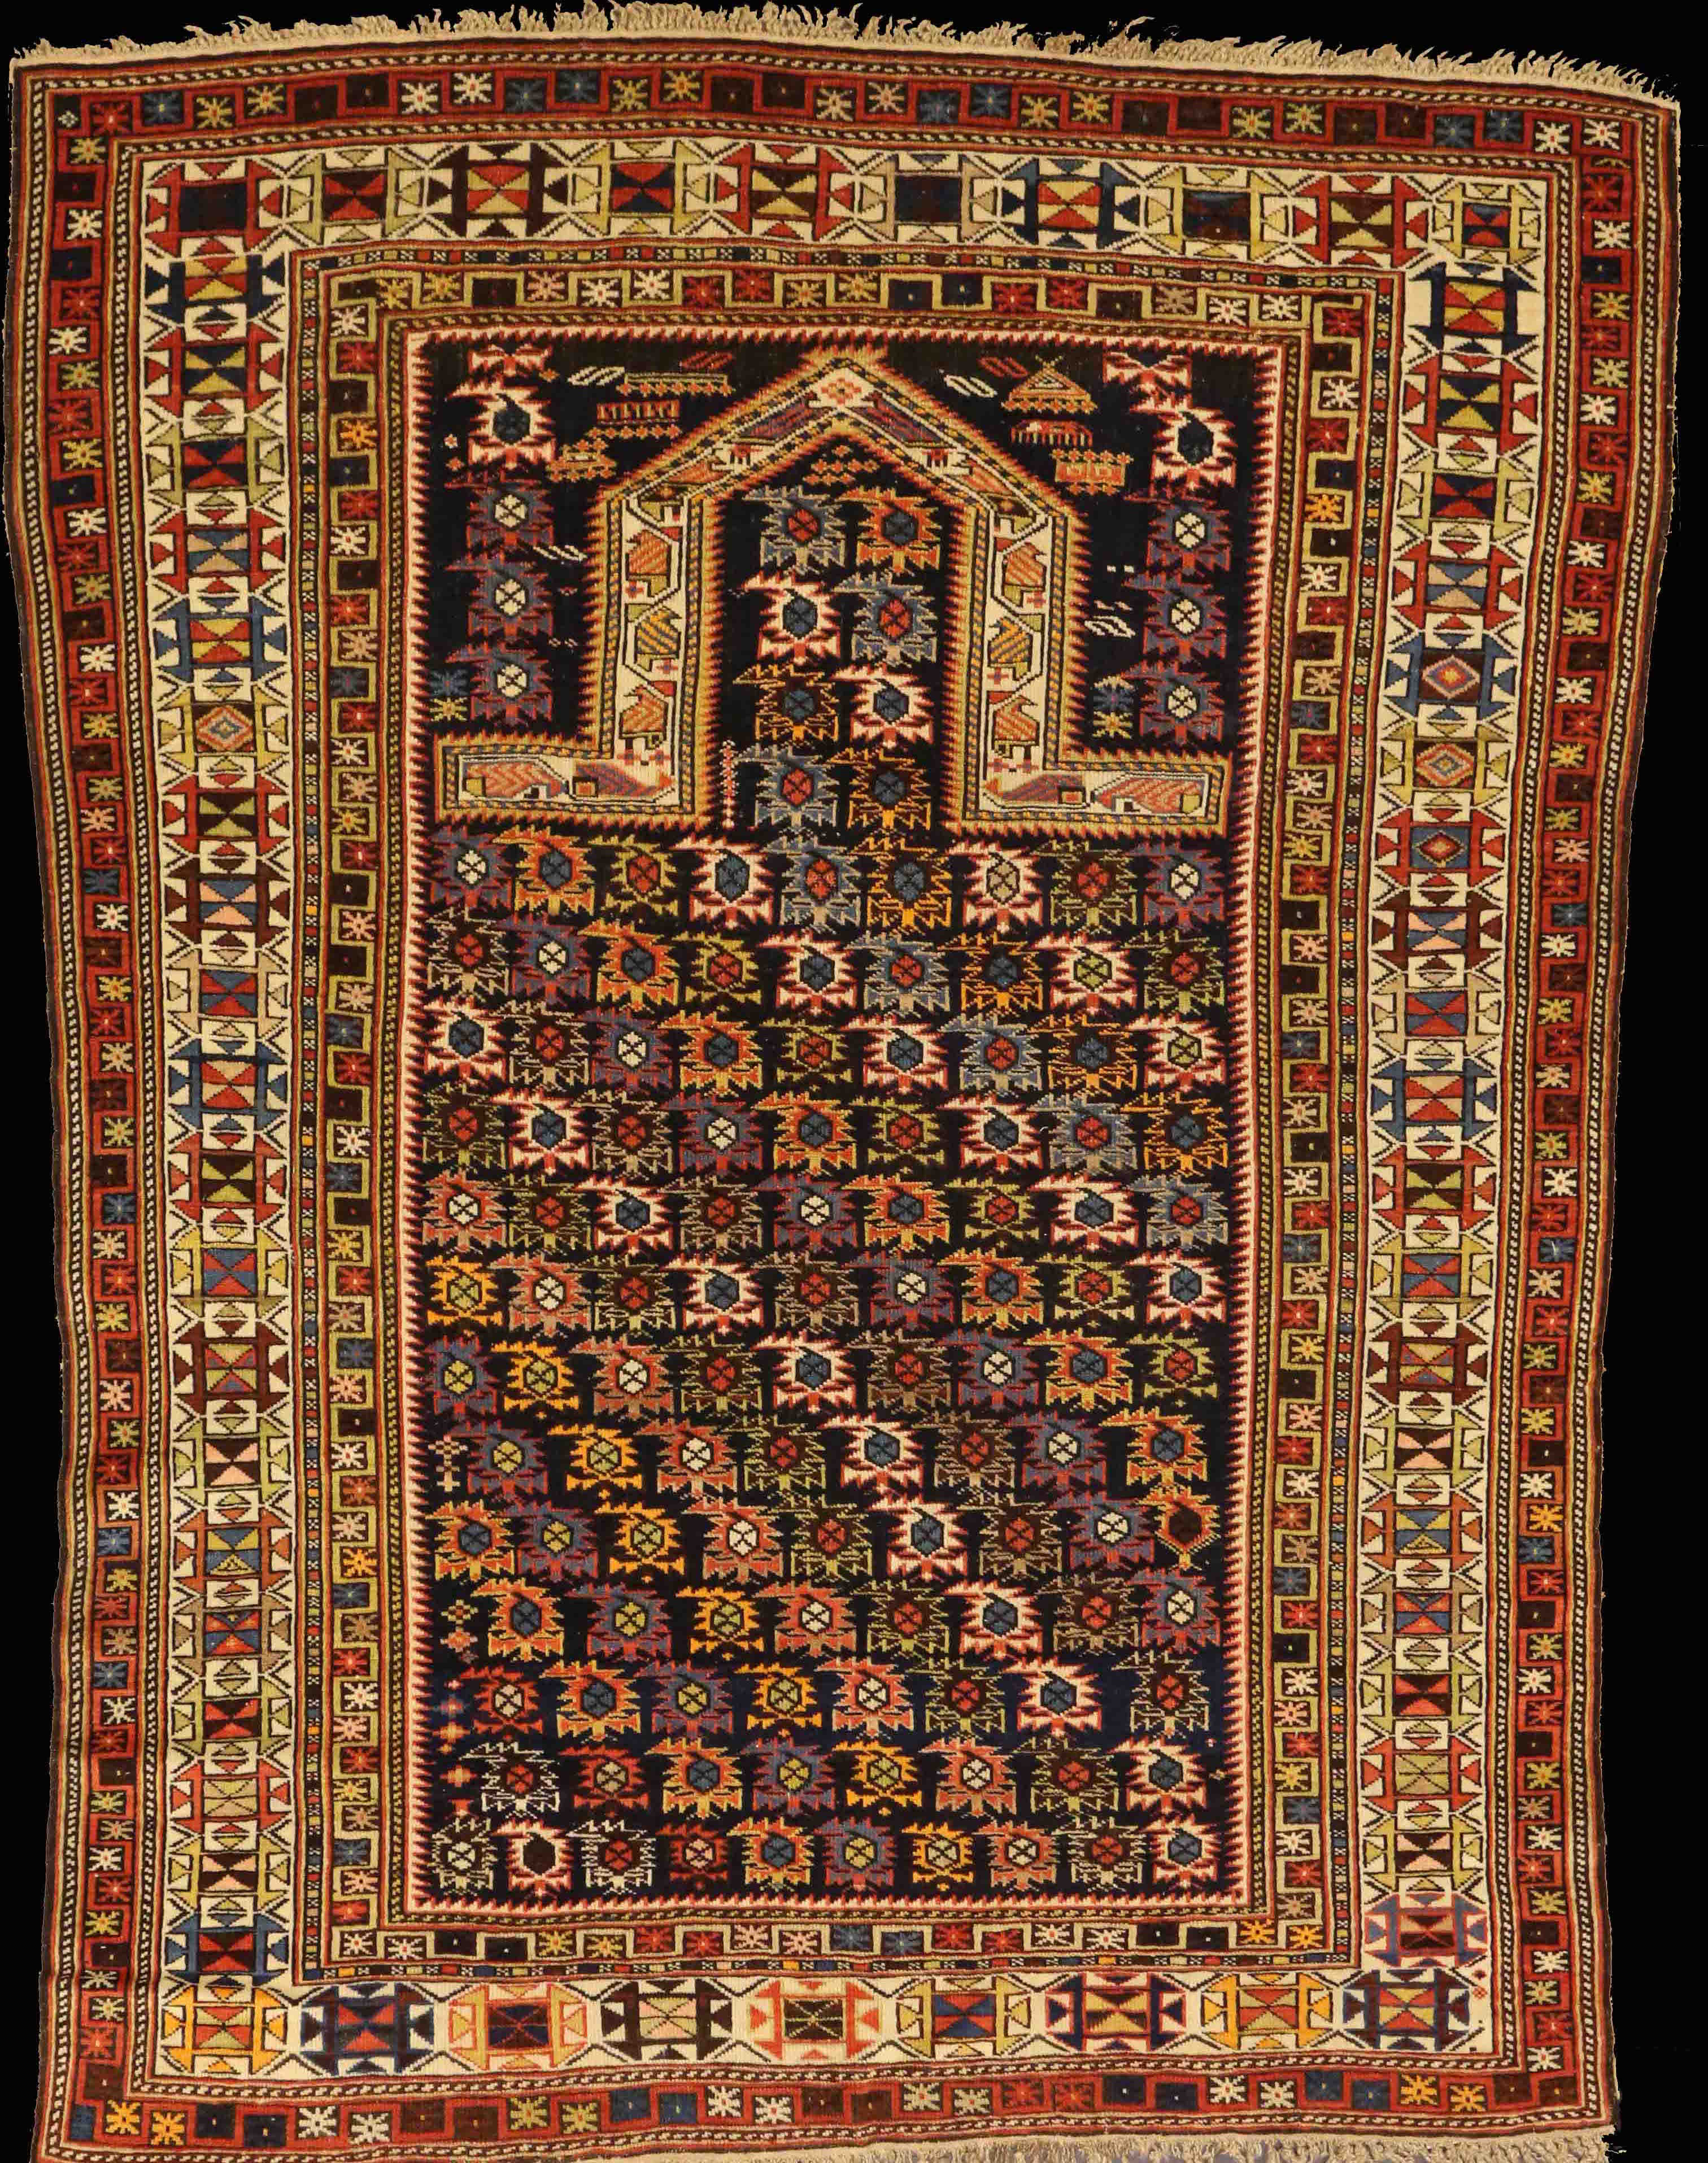 15443-shirvan-prayer-rug-155cm-x-118cm